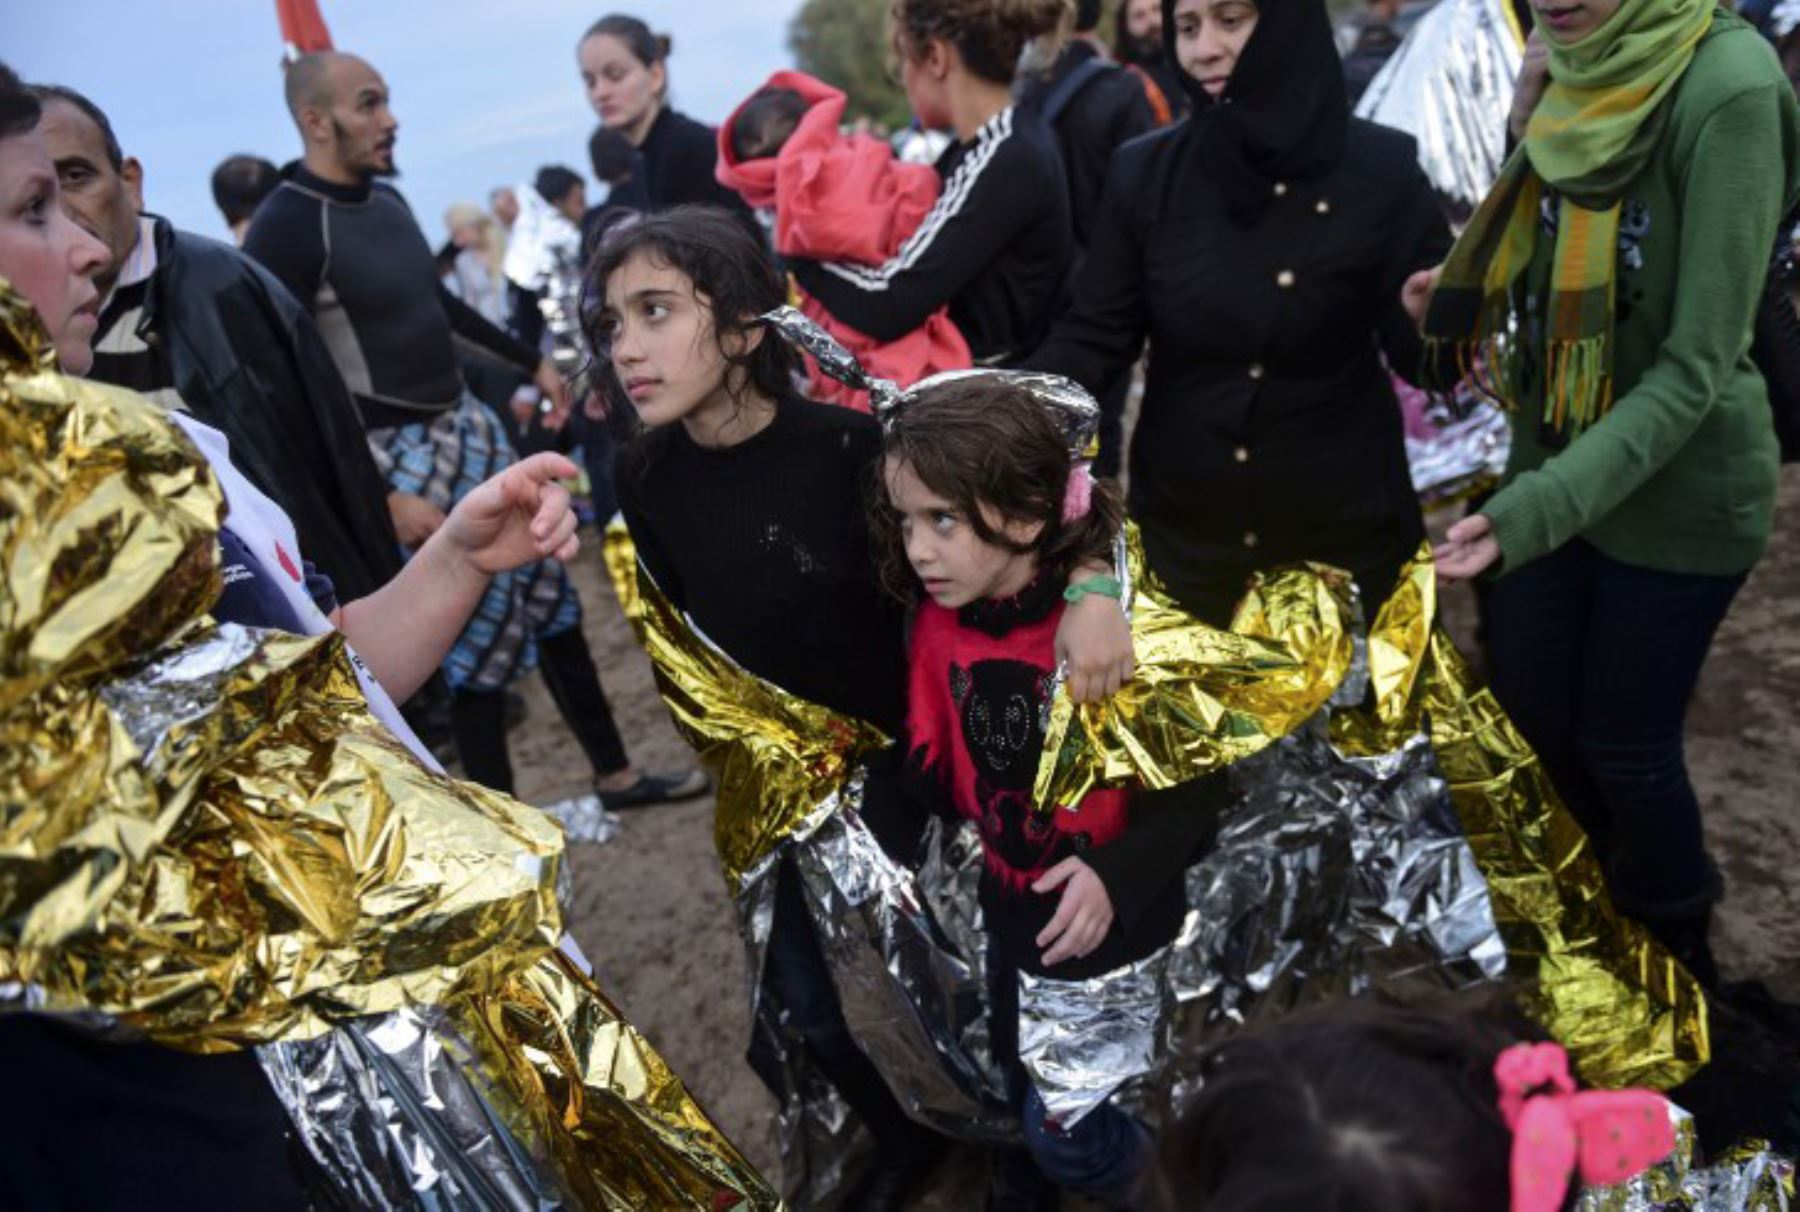 Llegada de refugiados a la isla griega de Lesbos. Foto: AFP